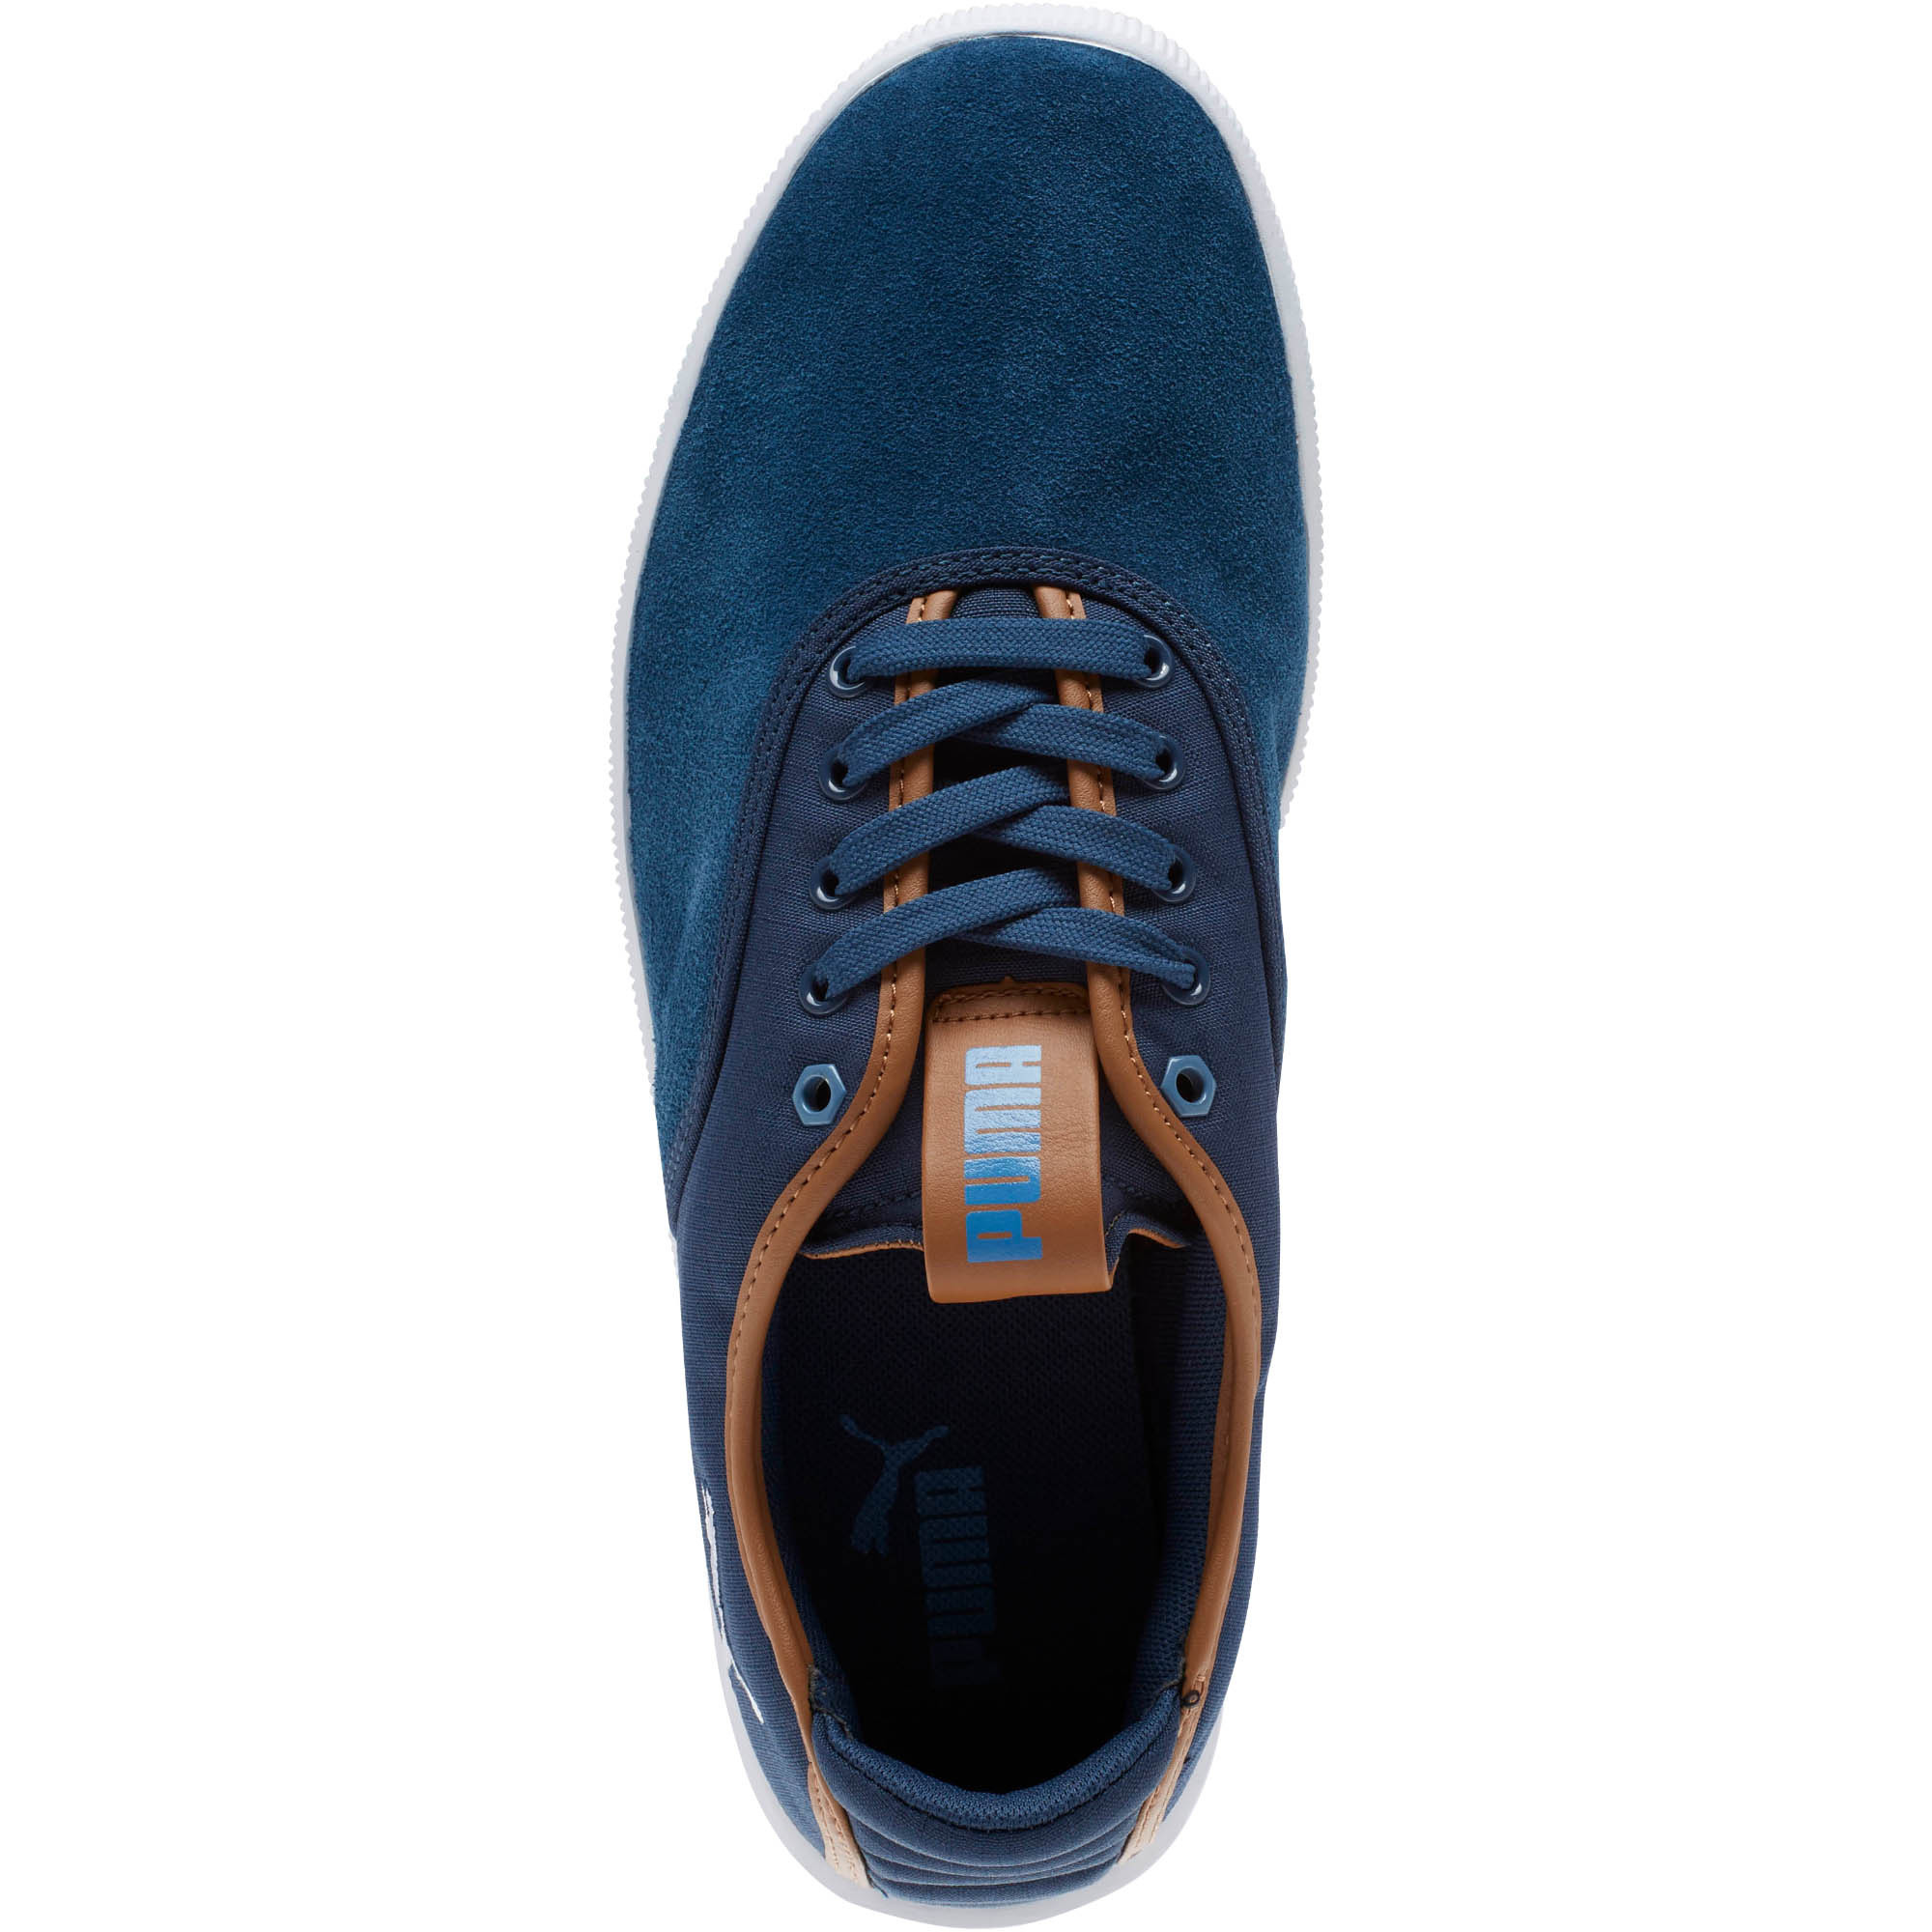 PUMA-Funist-Lo-MU-Men-039-s-Sneakers-Men-Shoe-Evolution thumbnail 11